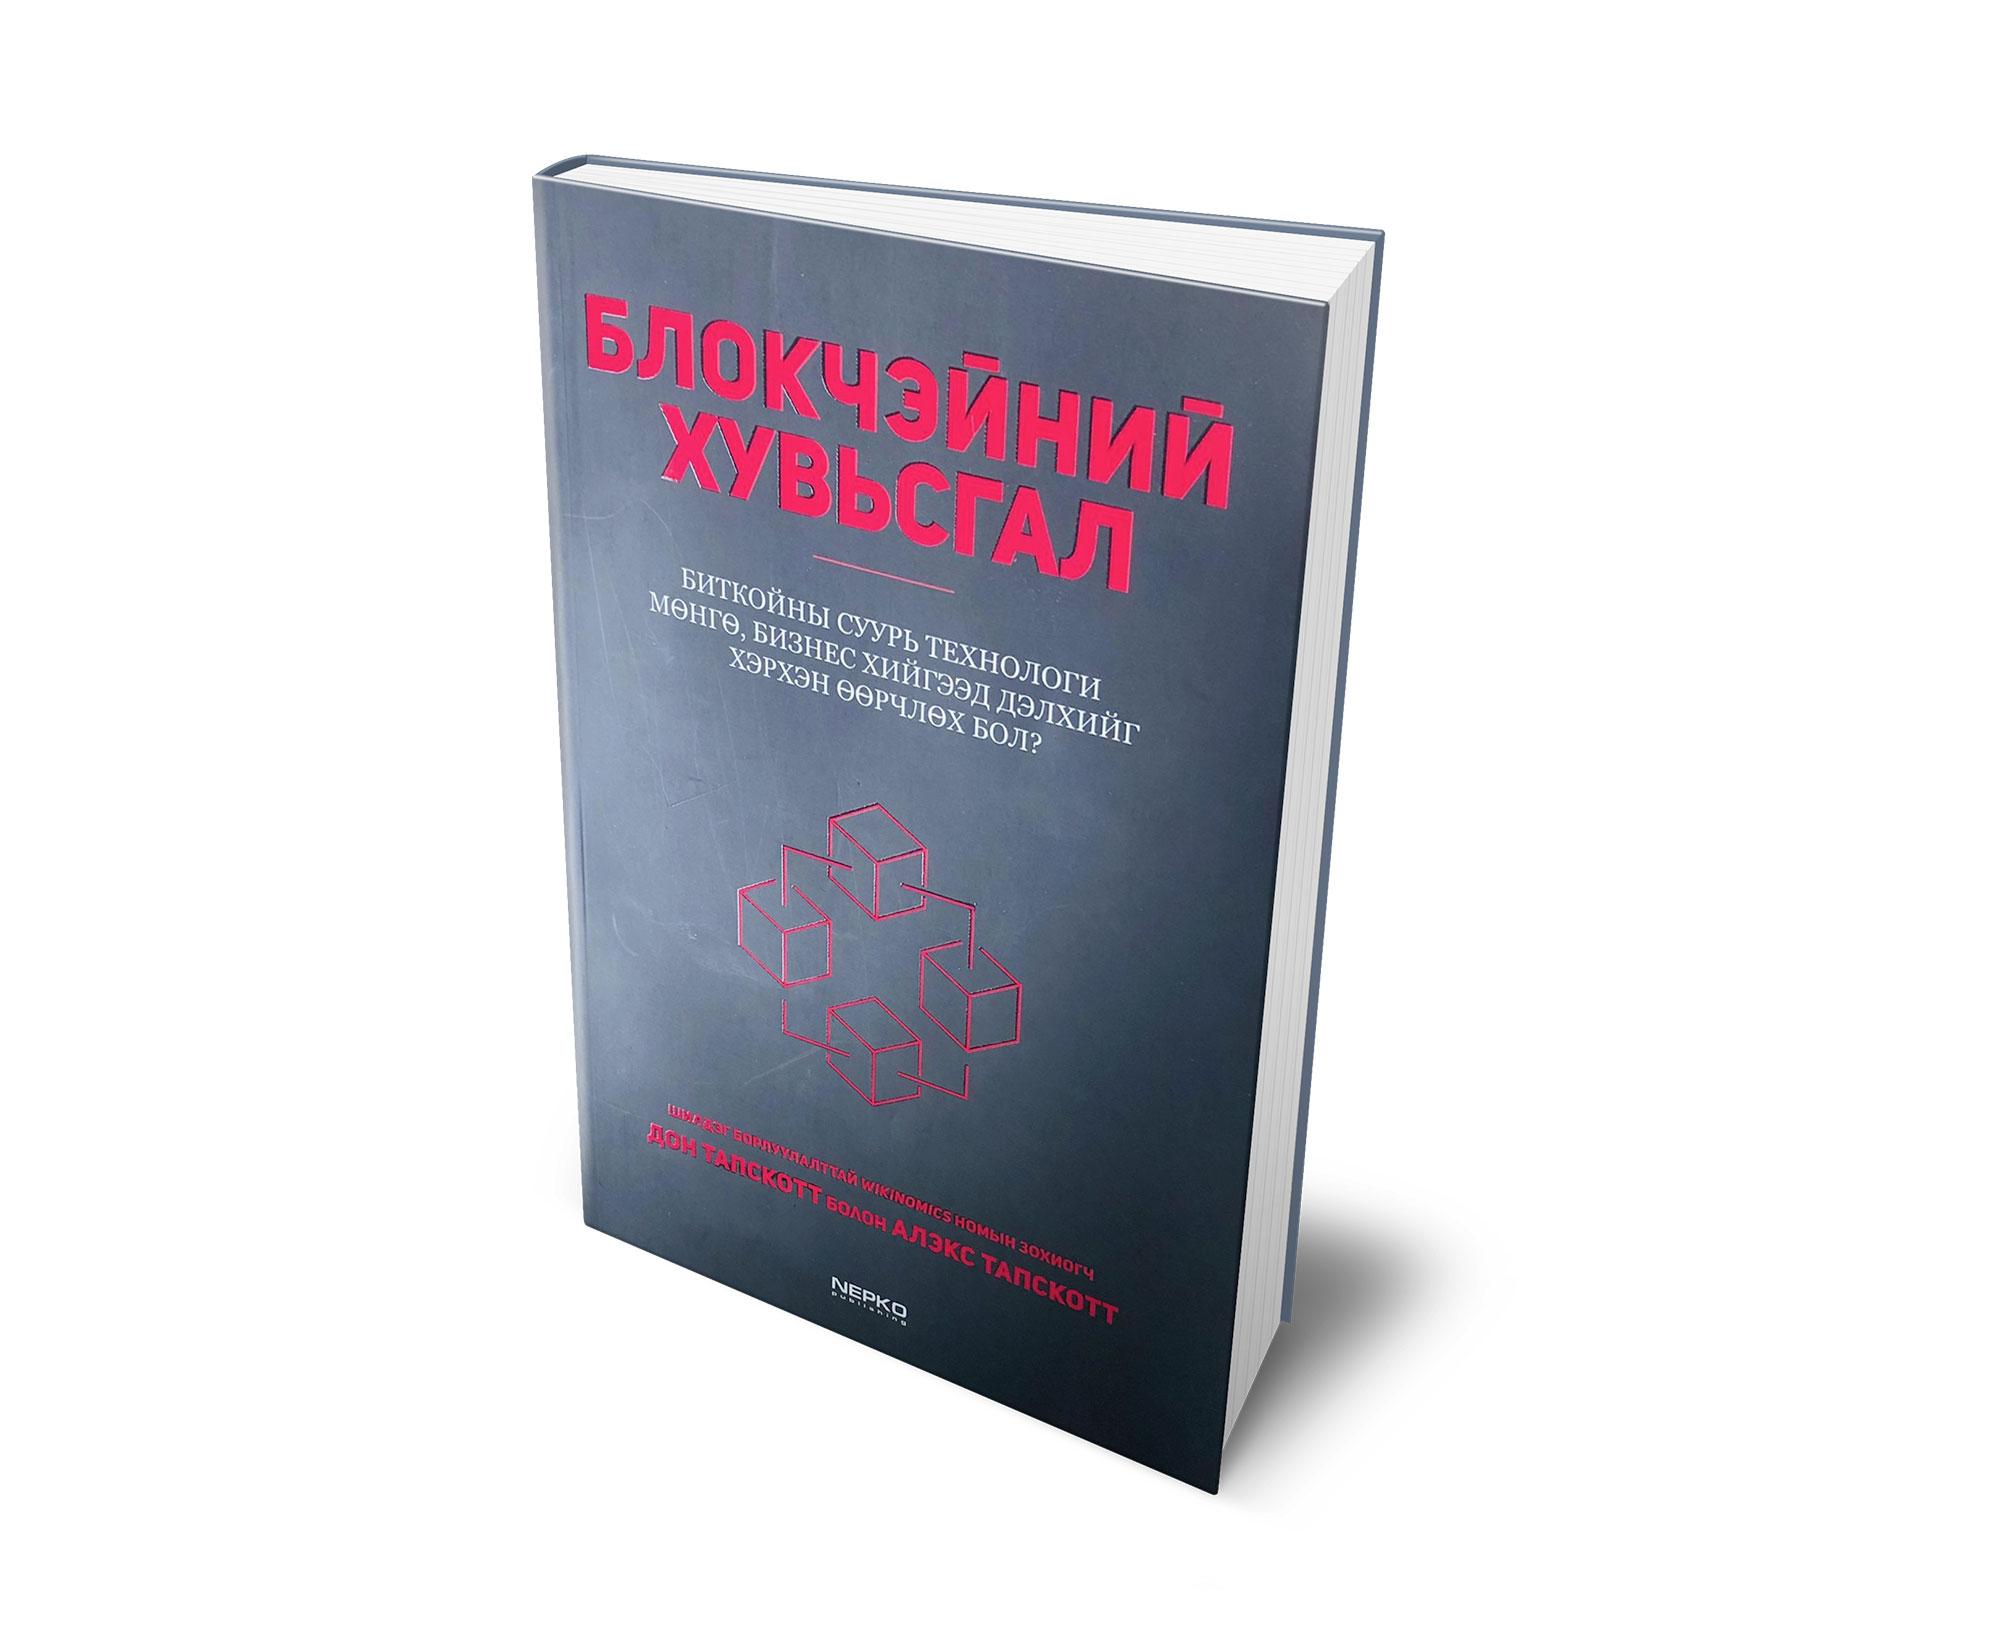 Blockchain Revolution - Mongolian